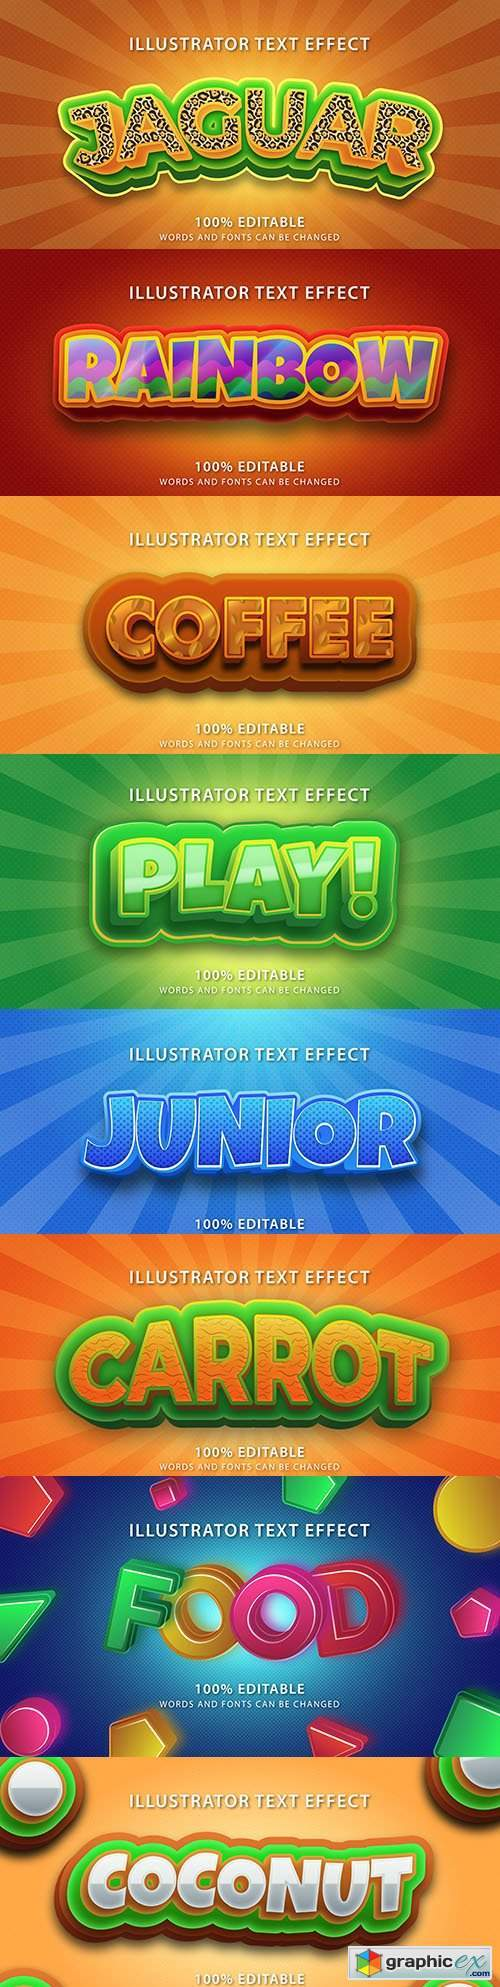 Editable font effect text collection illustration design 160